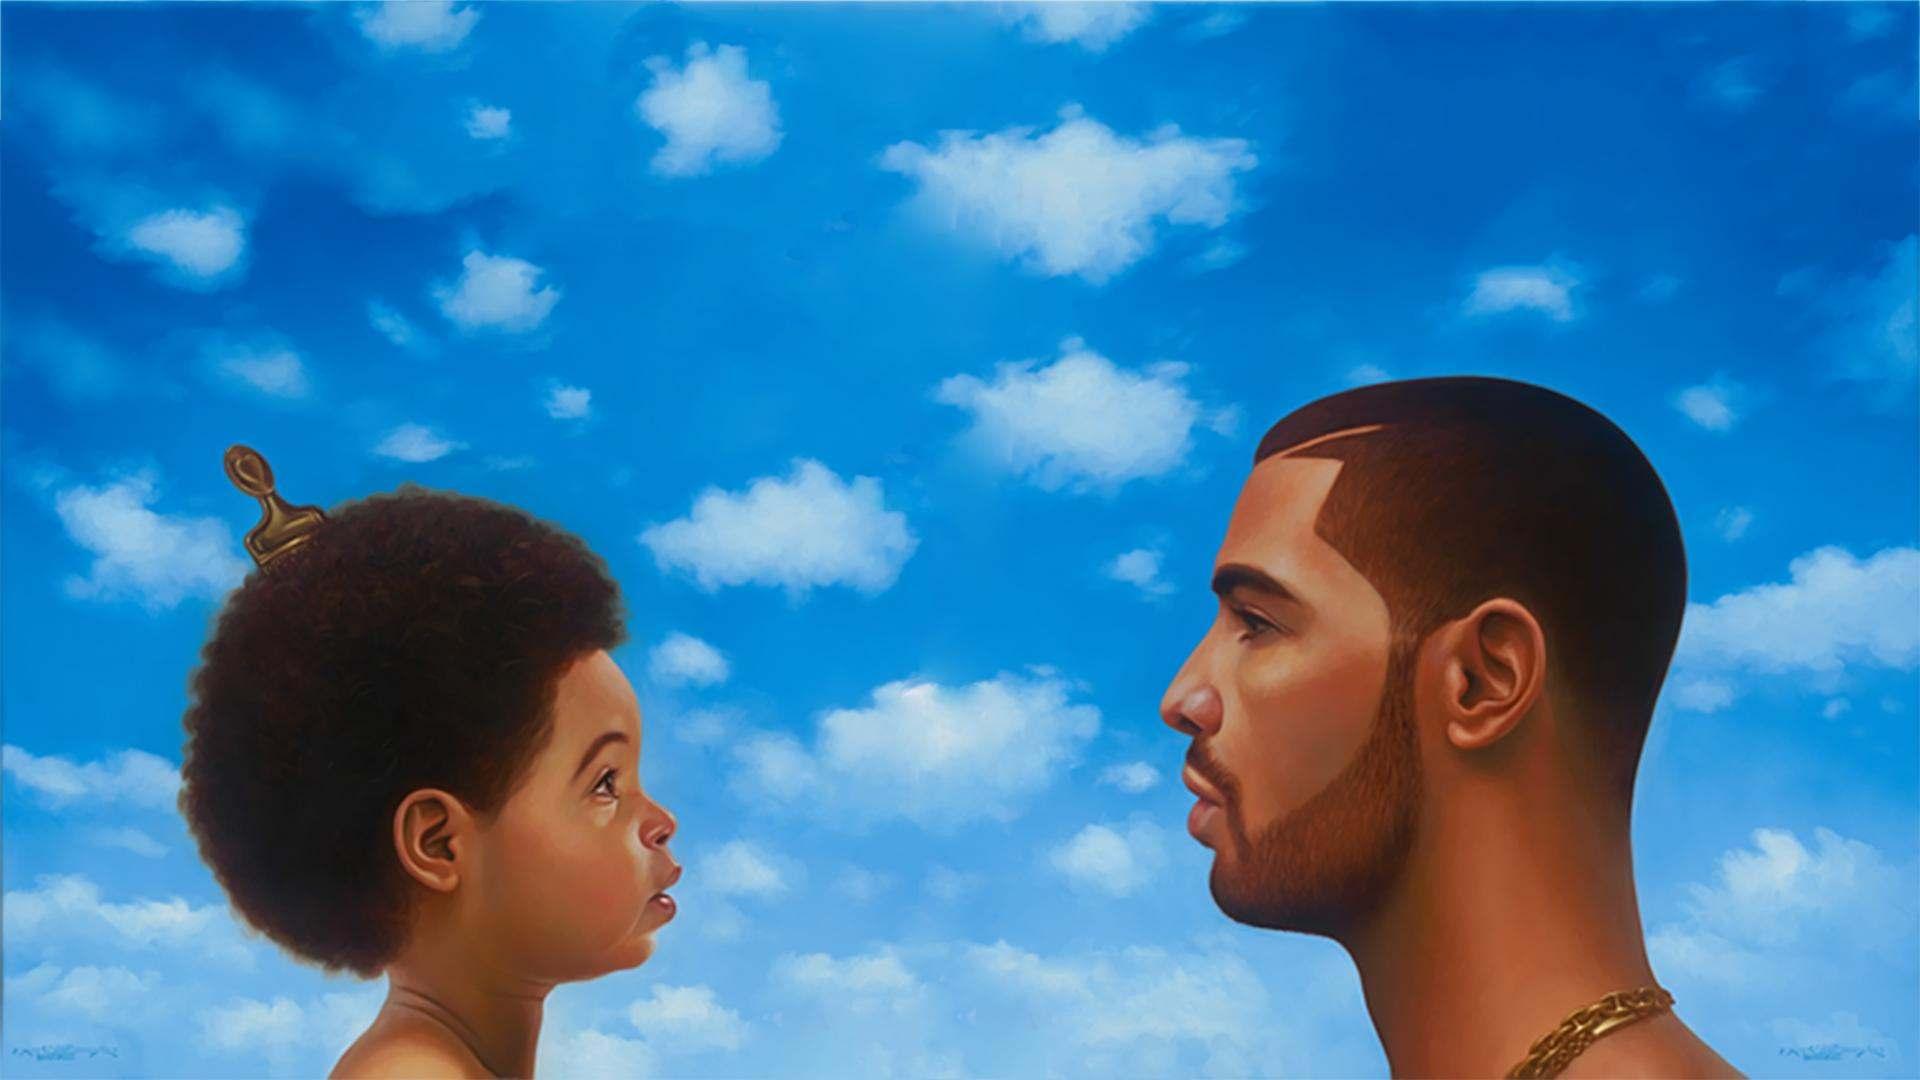 Drake Nothing Was The Same Album Cover Background (Kardhiac's Take) Dr...